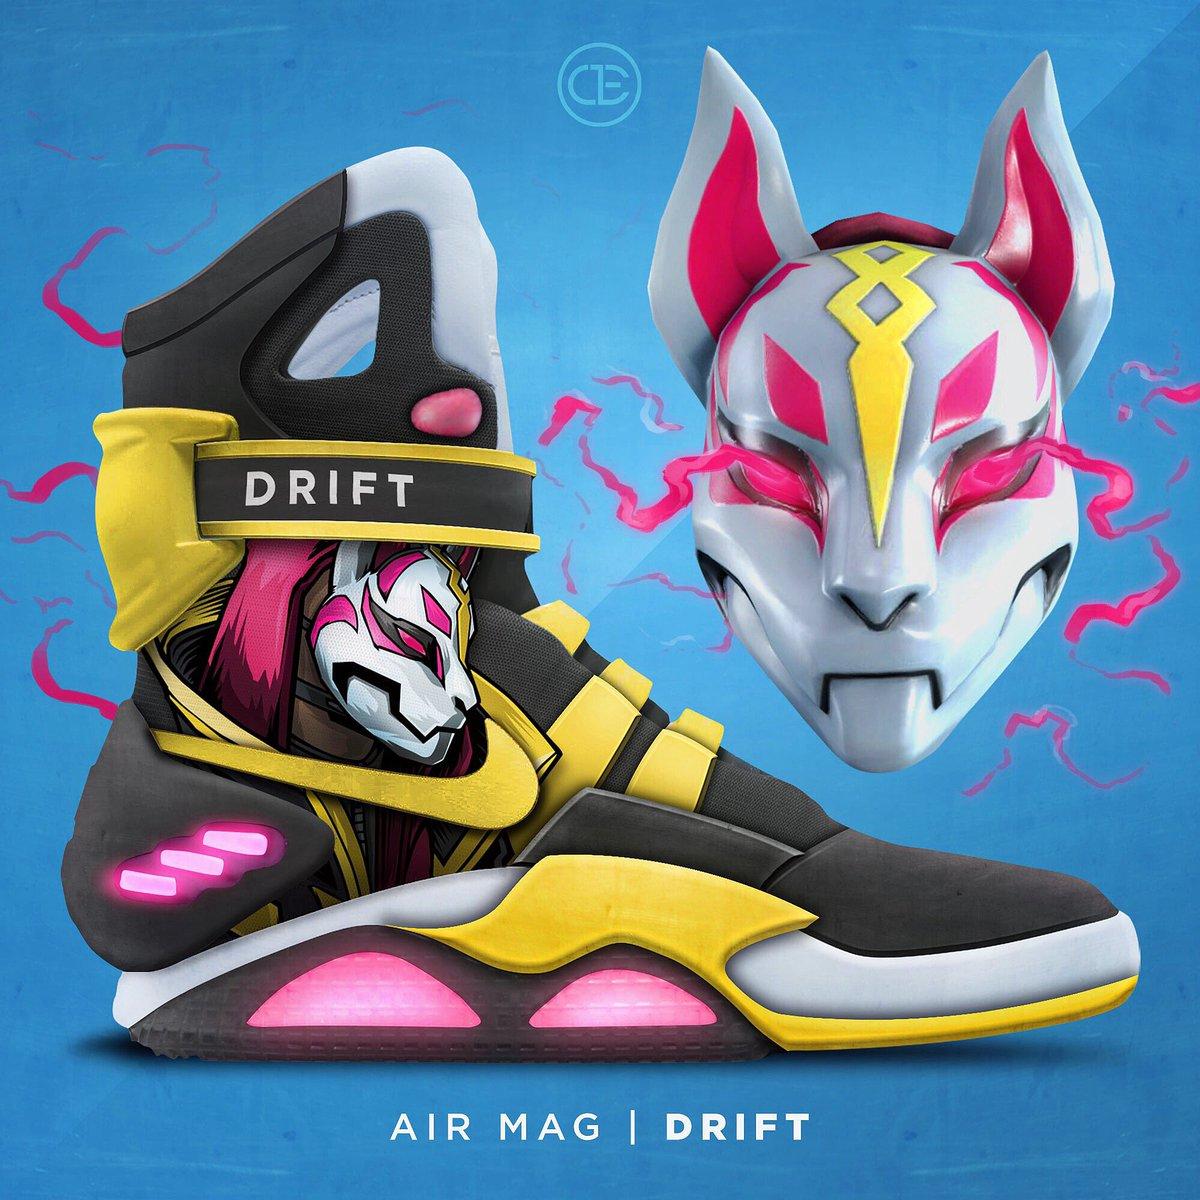 ec83edf9069d00 Nike air drift fortnite shoes yeezys jpg 1200x1200 Nike air drift fortnite  shoes yeezys